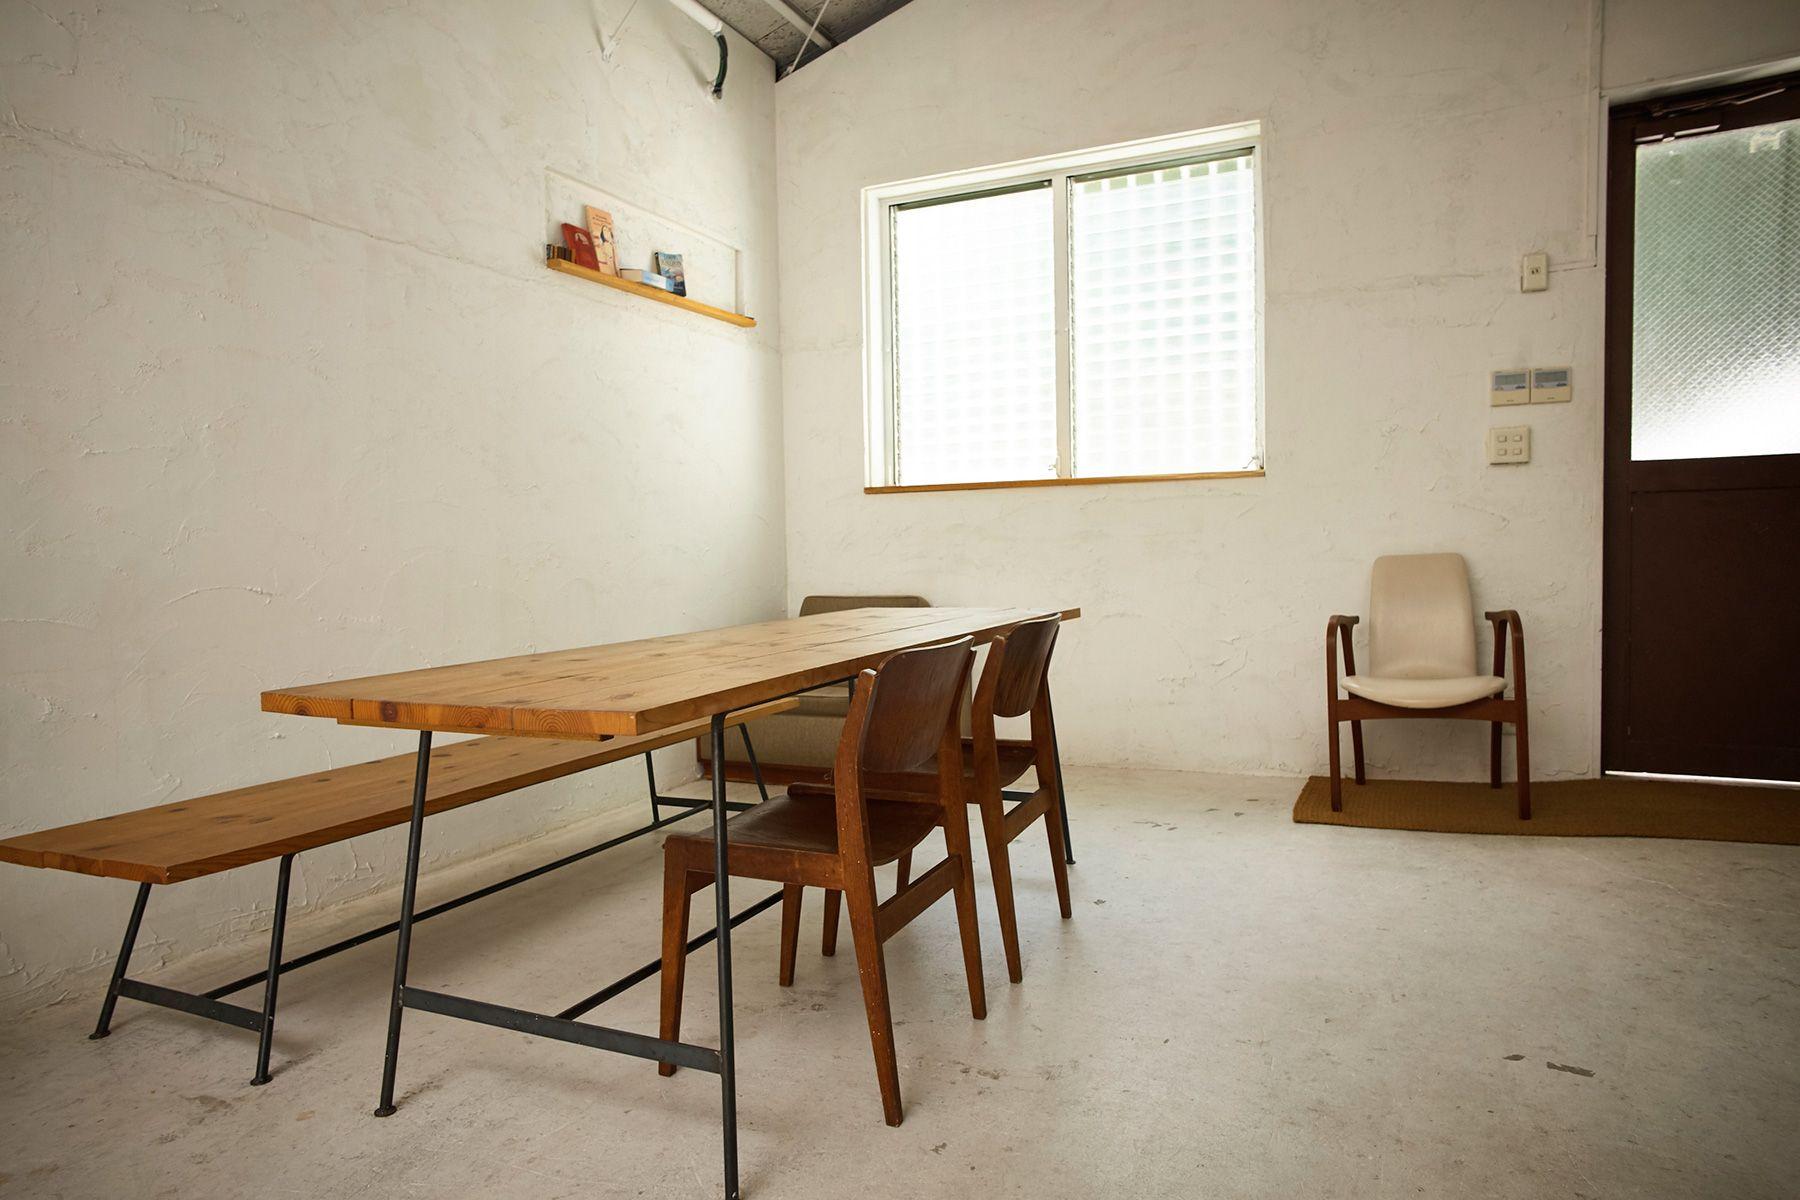 STUDIO MAU(スタジオ マウ)ミーティングスペース